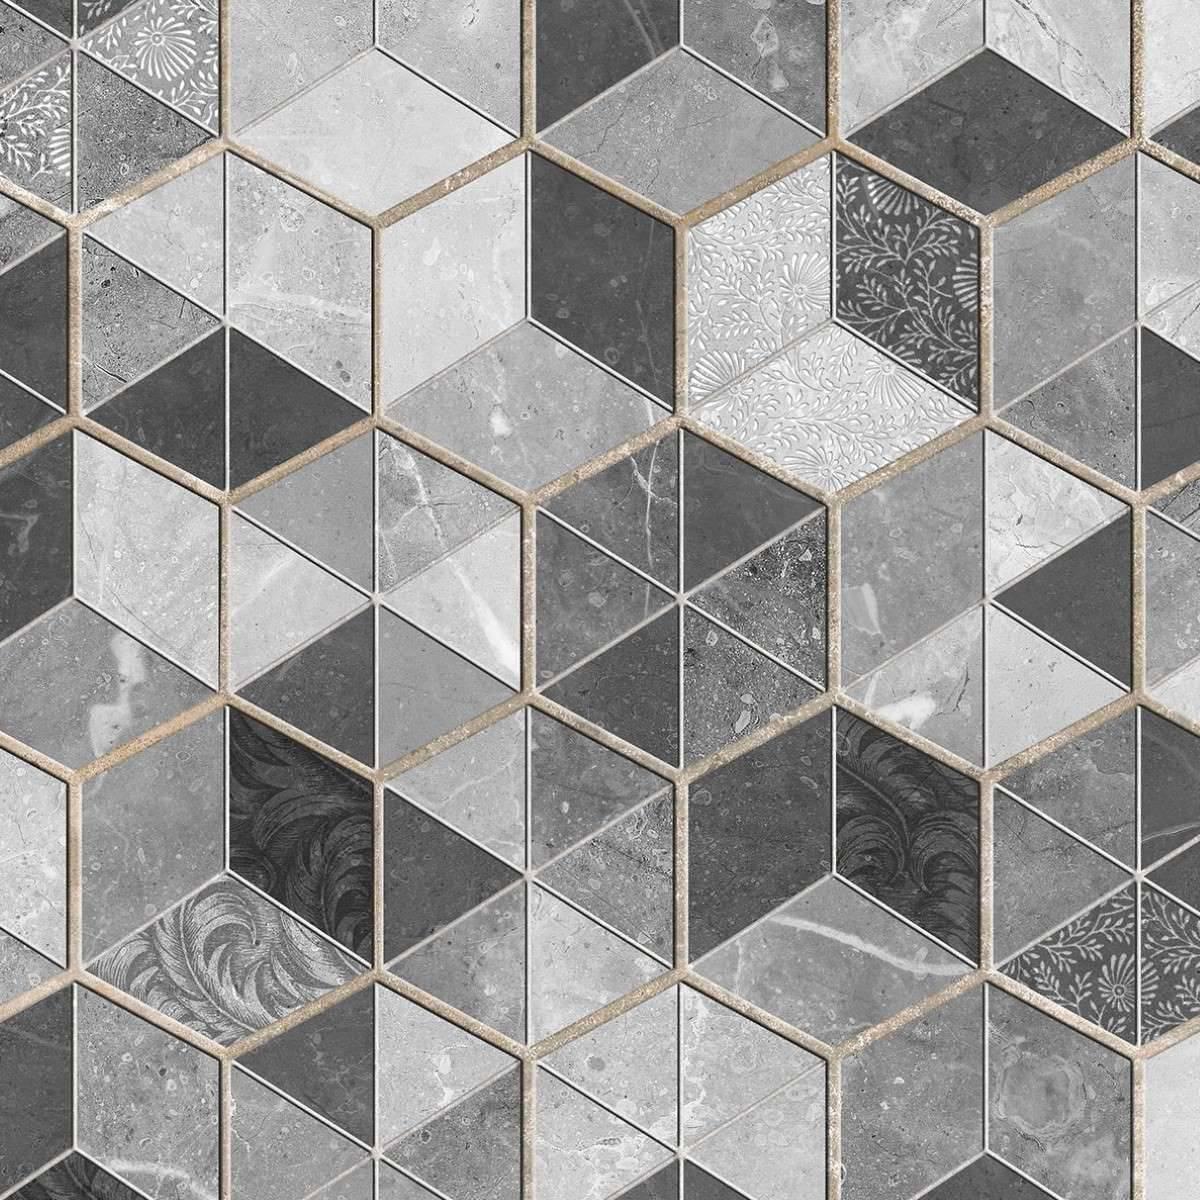 Papel de Parede Adesivo Geométrico 3D/ FRETE GRÁTIS P/ SP - Redecorei